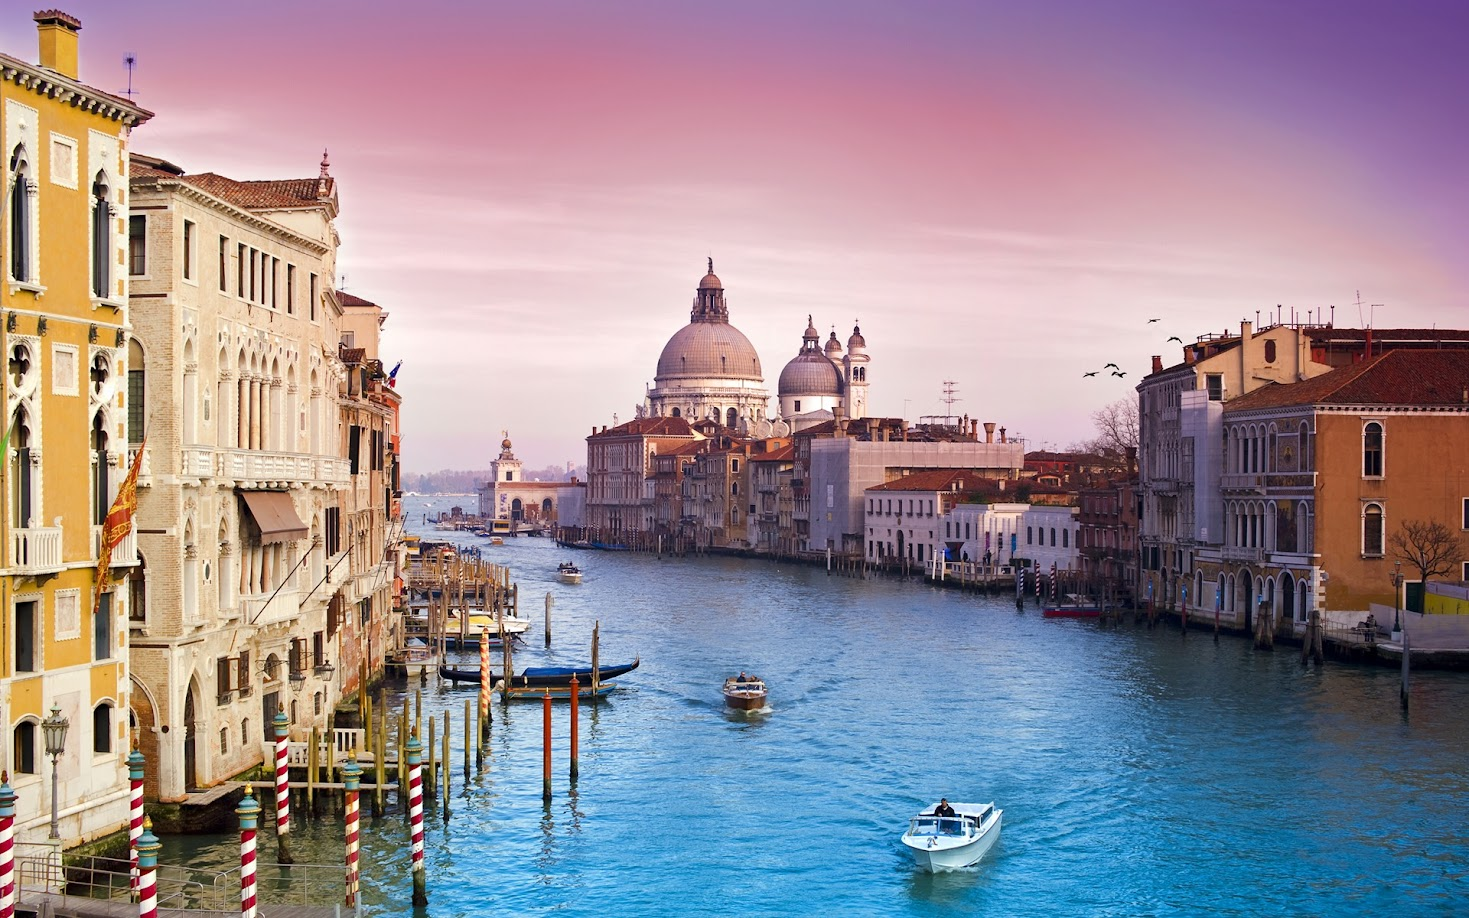 Lentodiilit Venetsia Italia, Budjettimatka.com